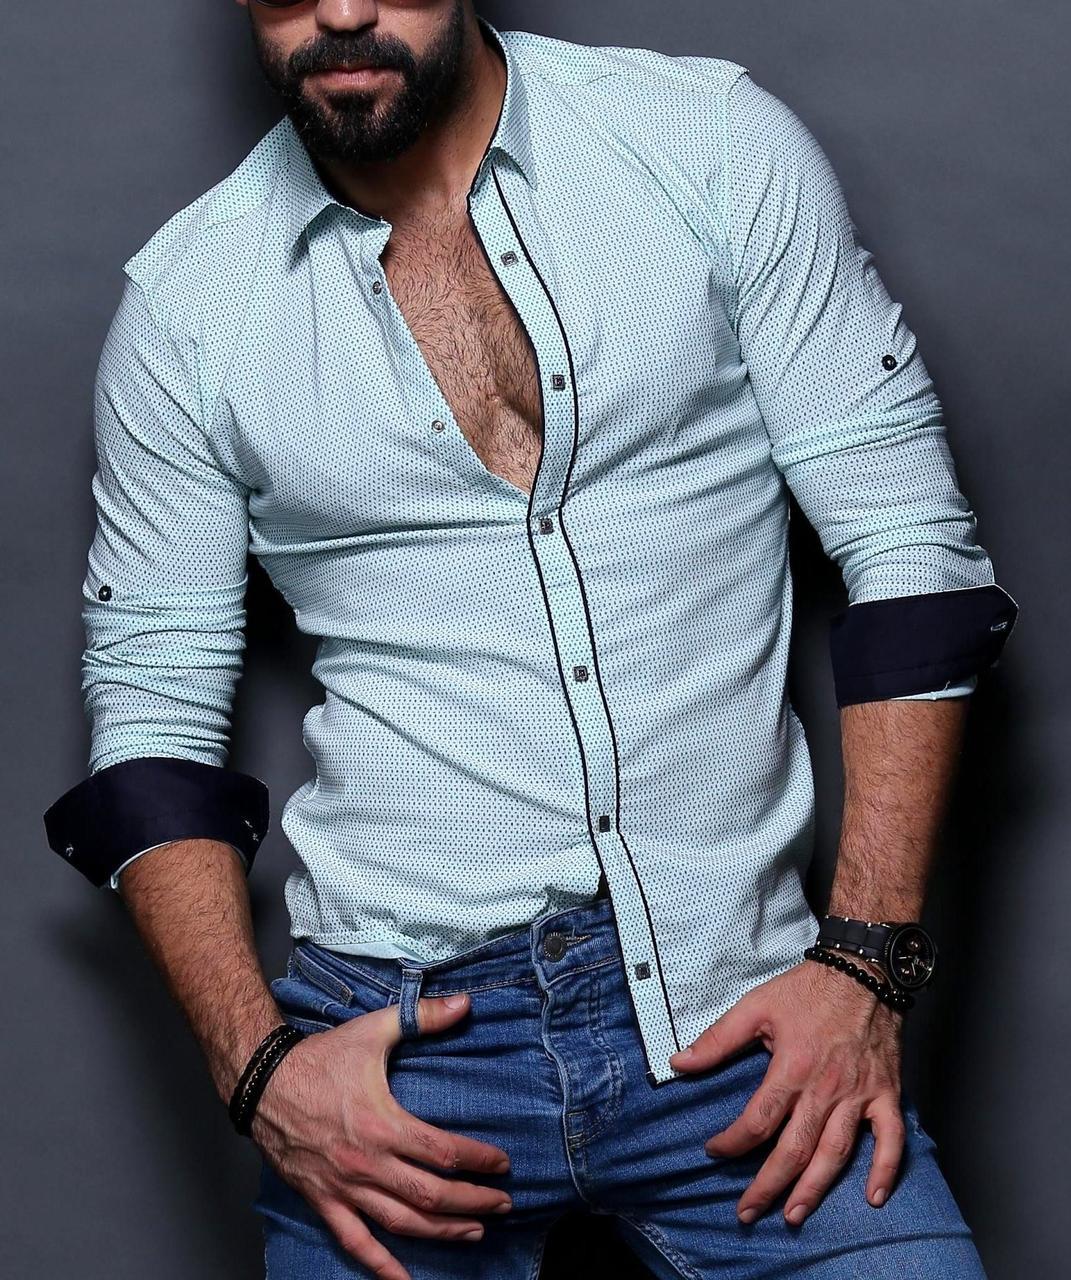 404ffeb15e4 Стильная рубашка для мужчин на планке нежно-голубого цвета